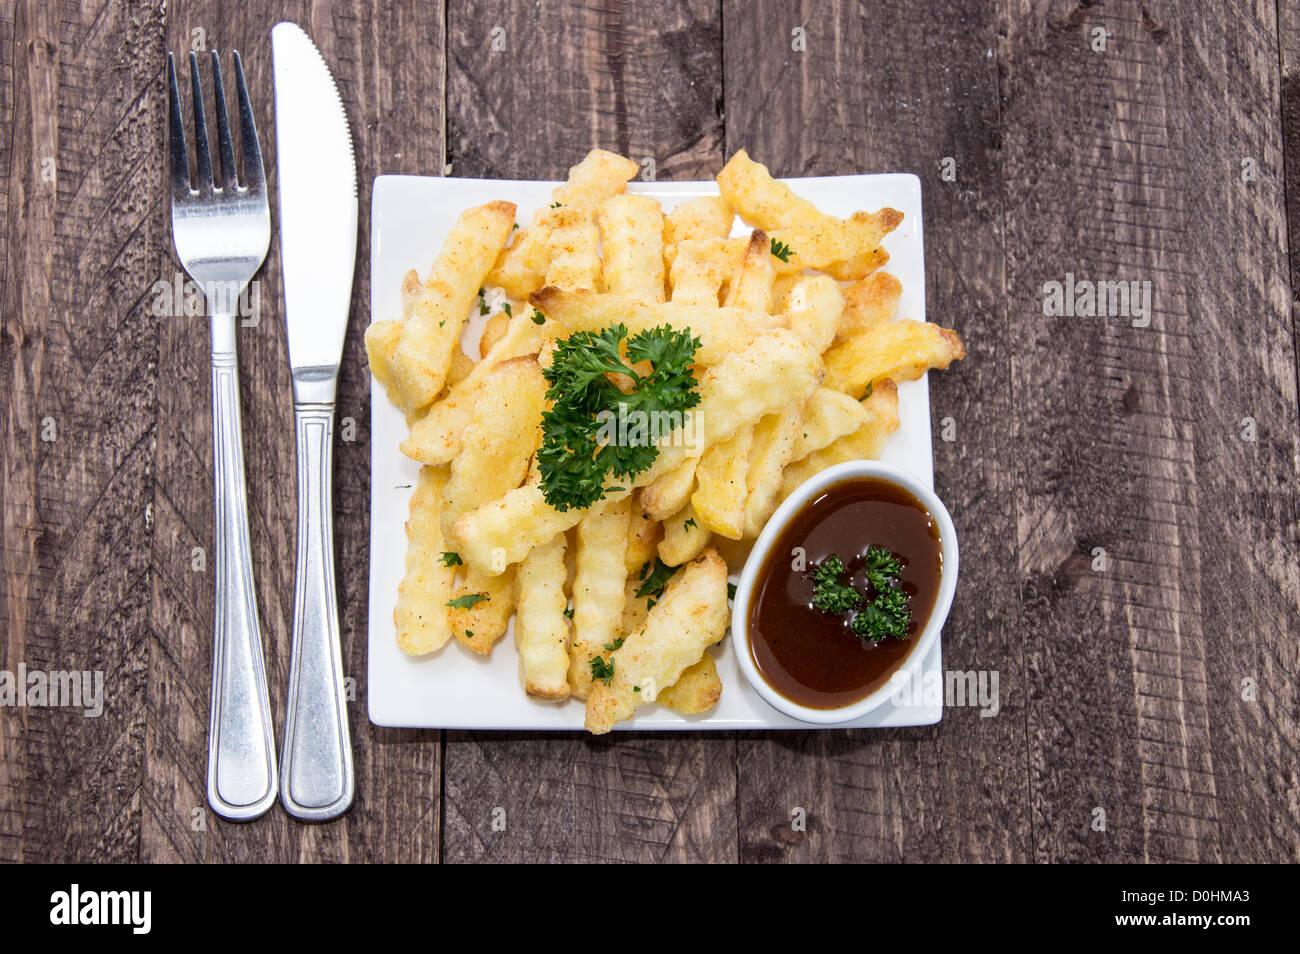 Fresh fried French Fries on wood - Stock Image